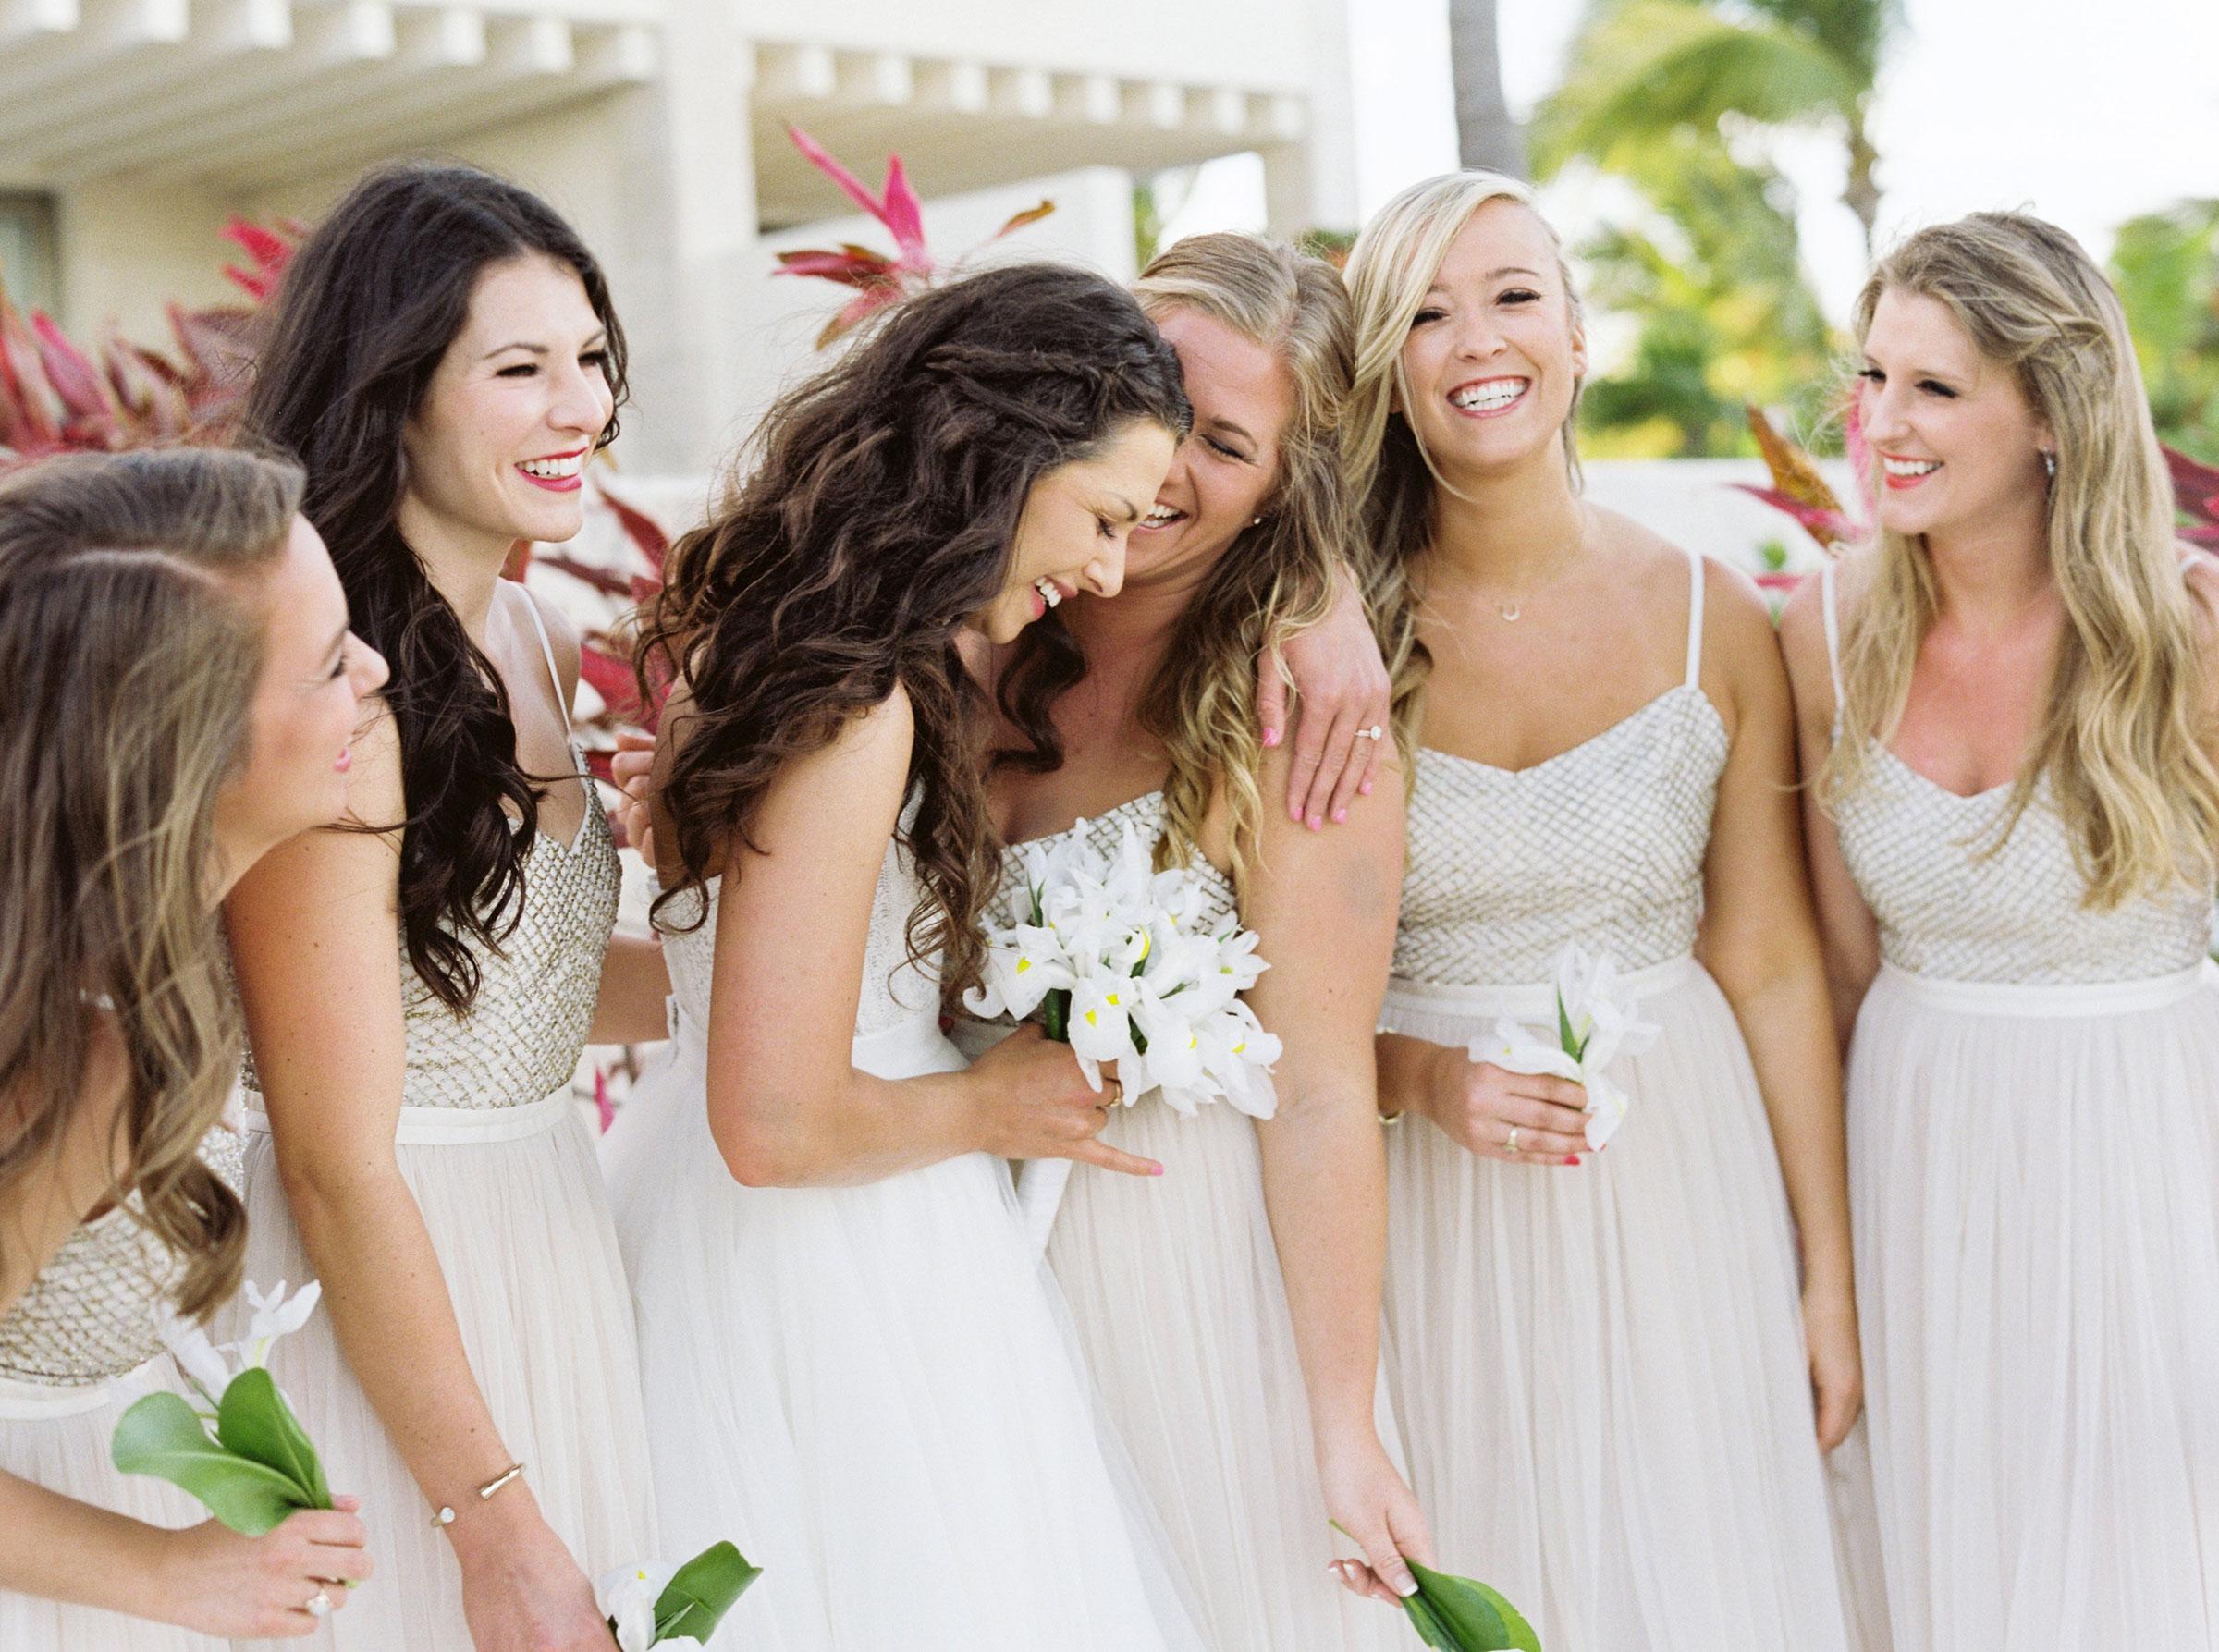 Destination wedding in Mexico, Bride and Bridesmaids, Bridal Separates, Coppelia Dress, Beach Wedding, Watters Ashan Skirt.